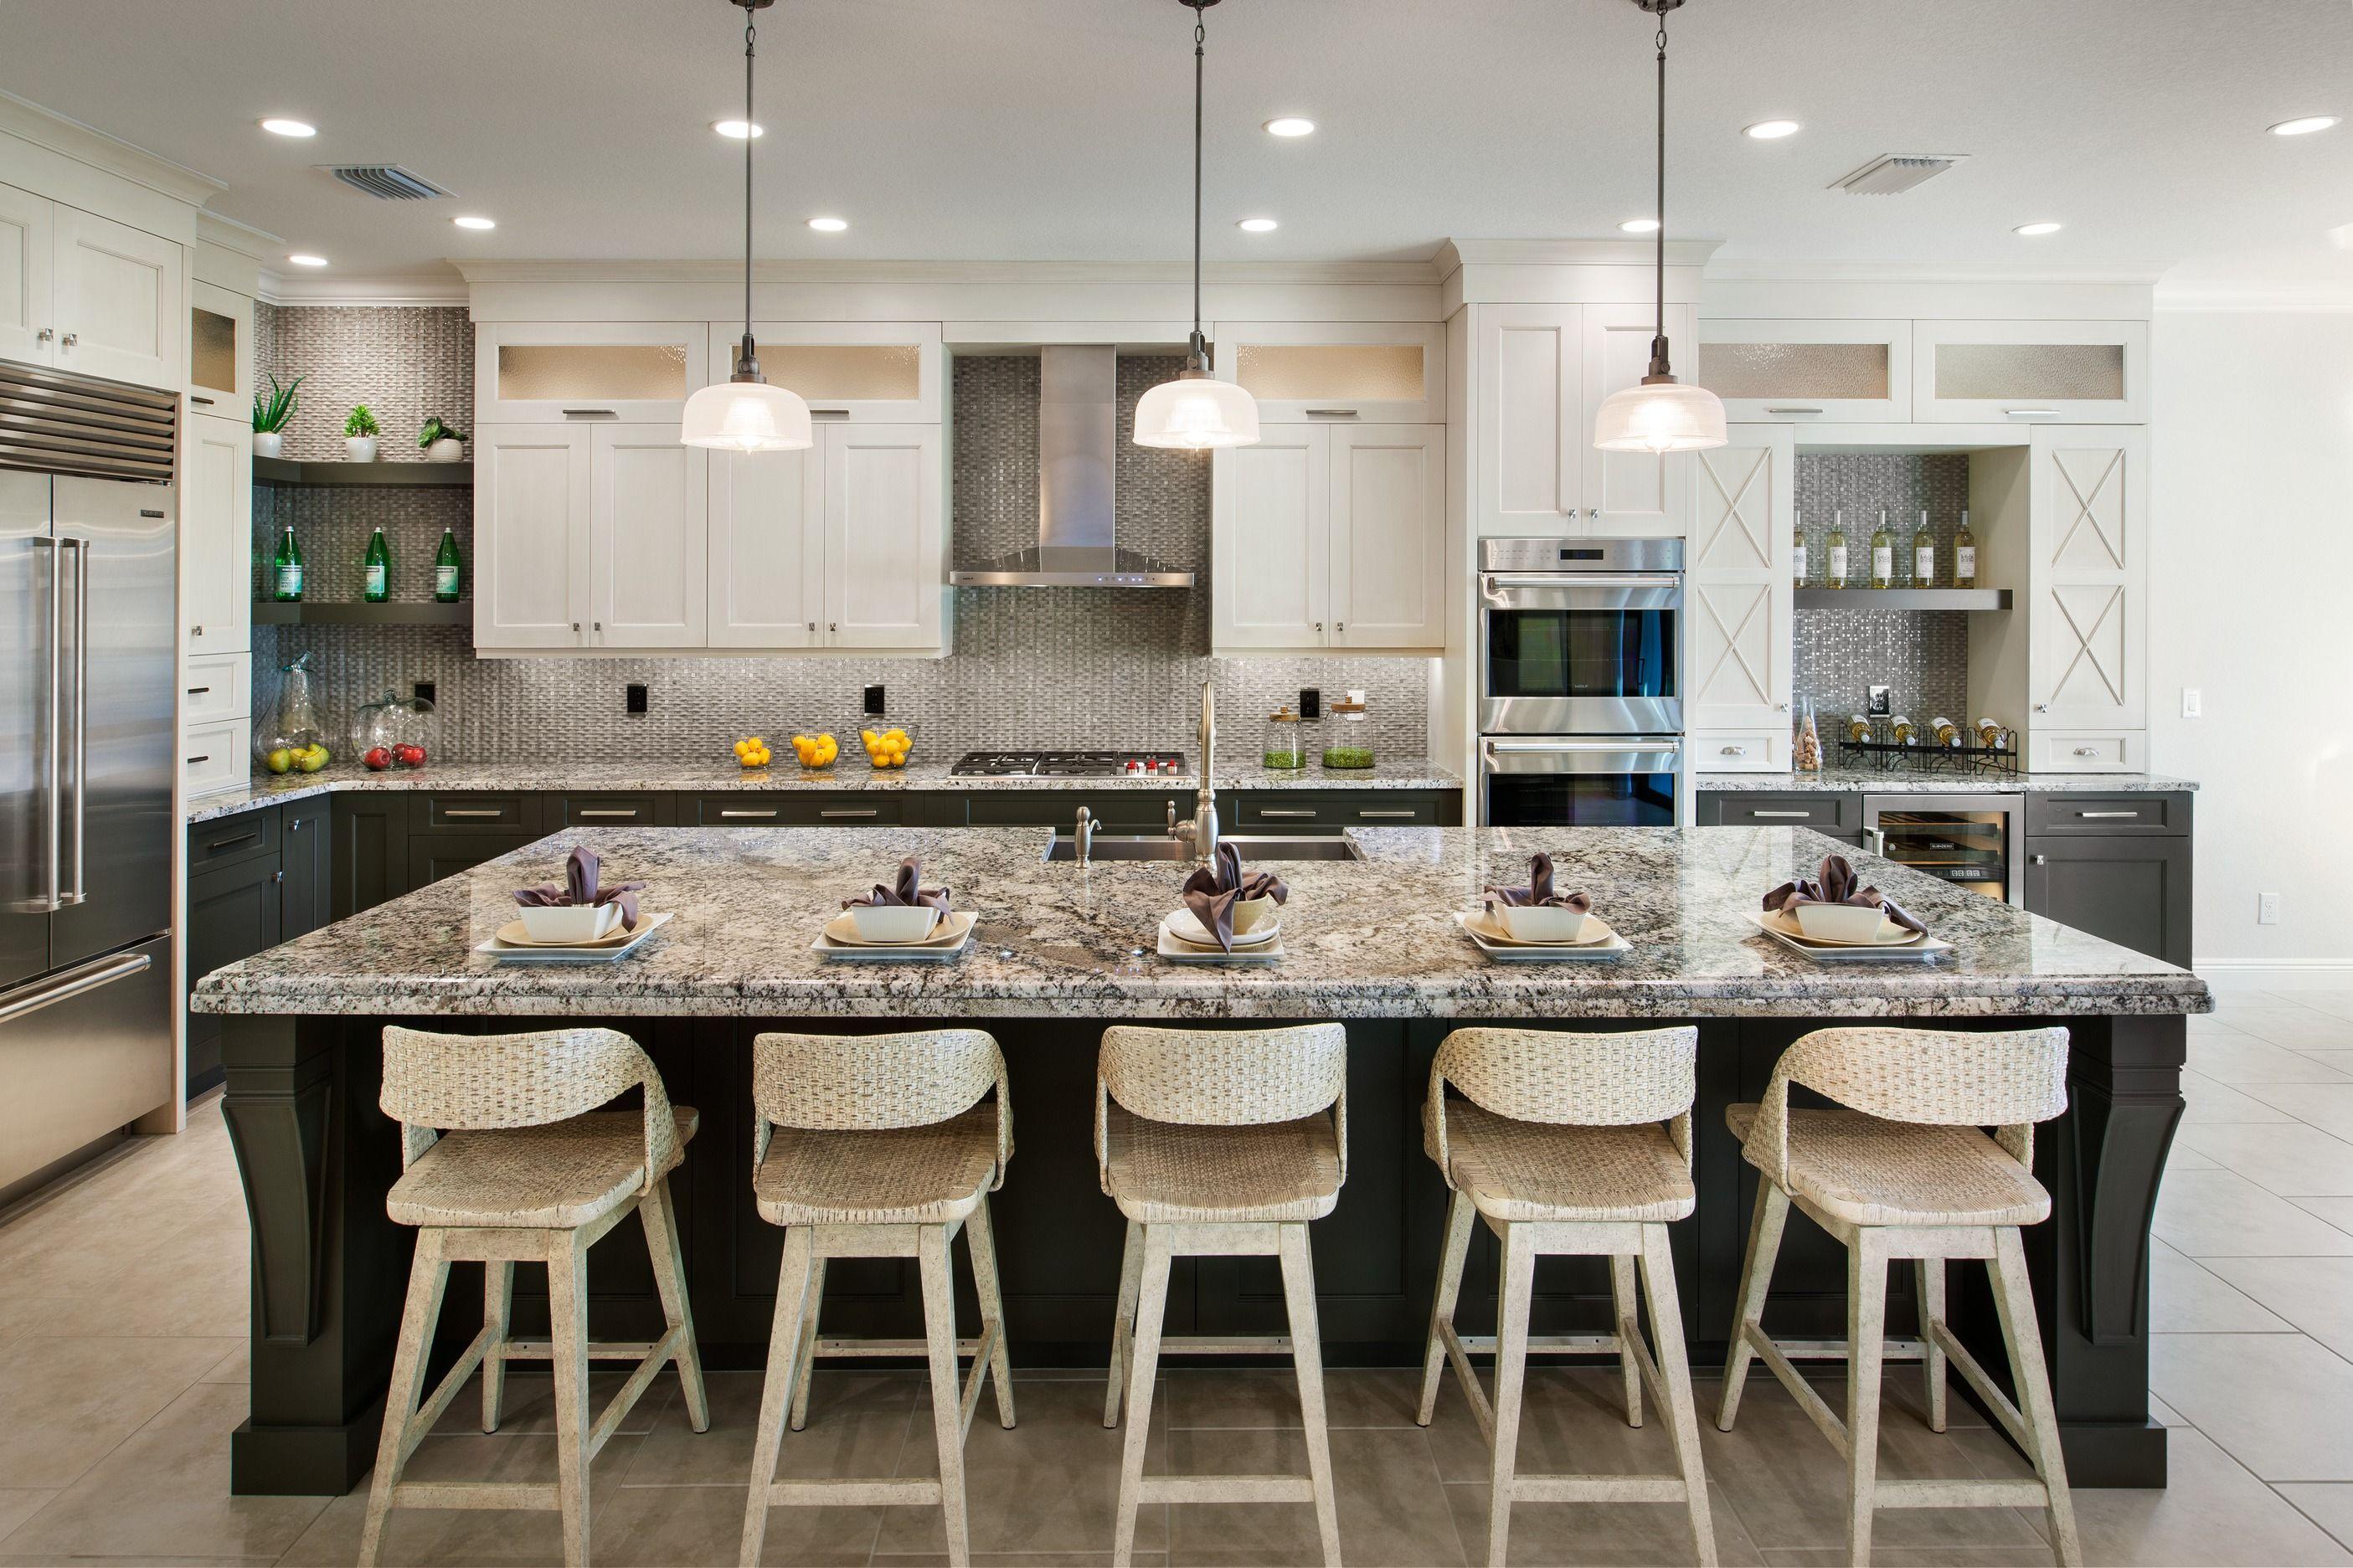 kitchen cabinets naples fl cheap decor tiletuesday features our lucente certosa mosaic wave as a